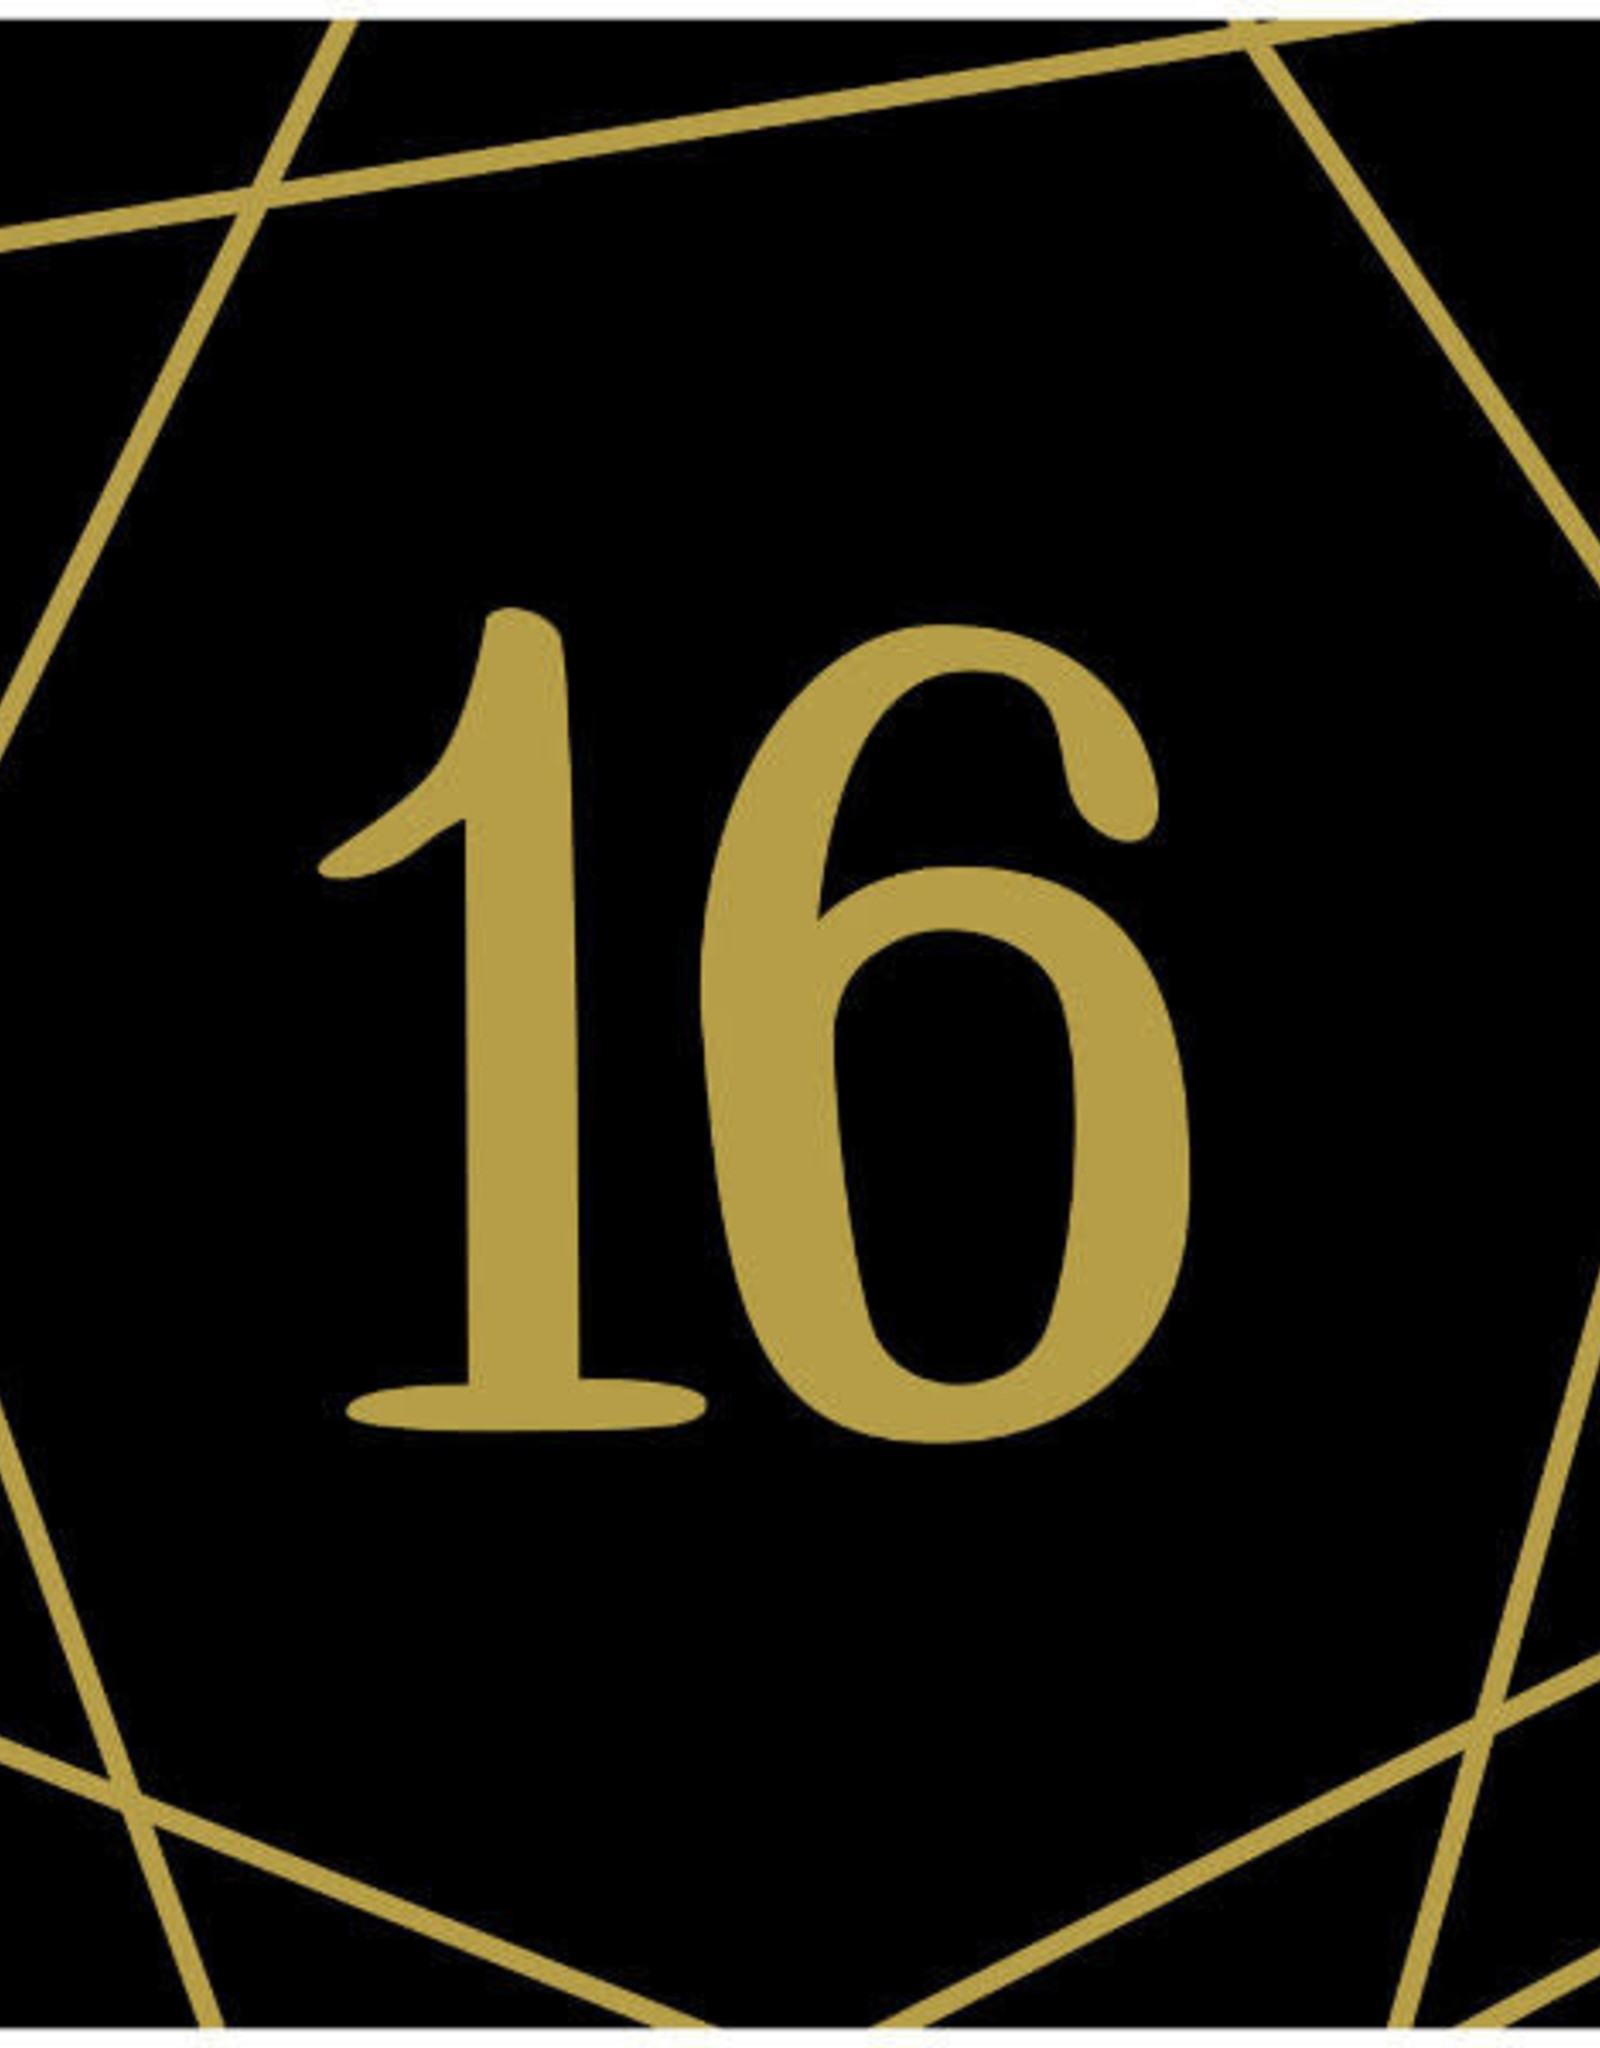 16th Birthday Gold & Black Beverage Napkins